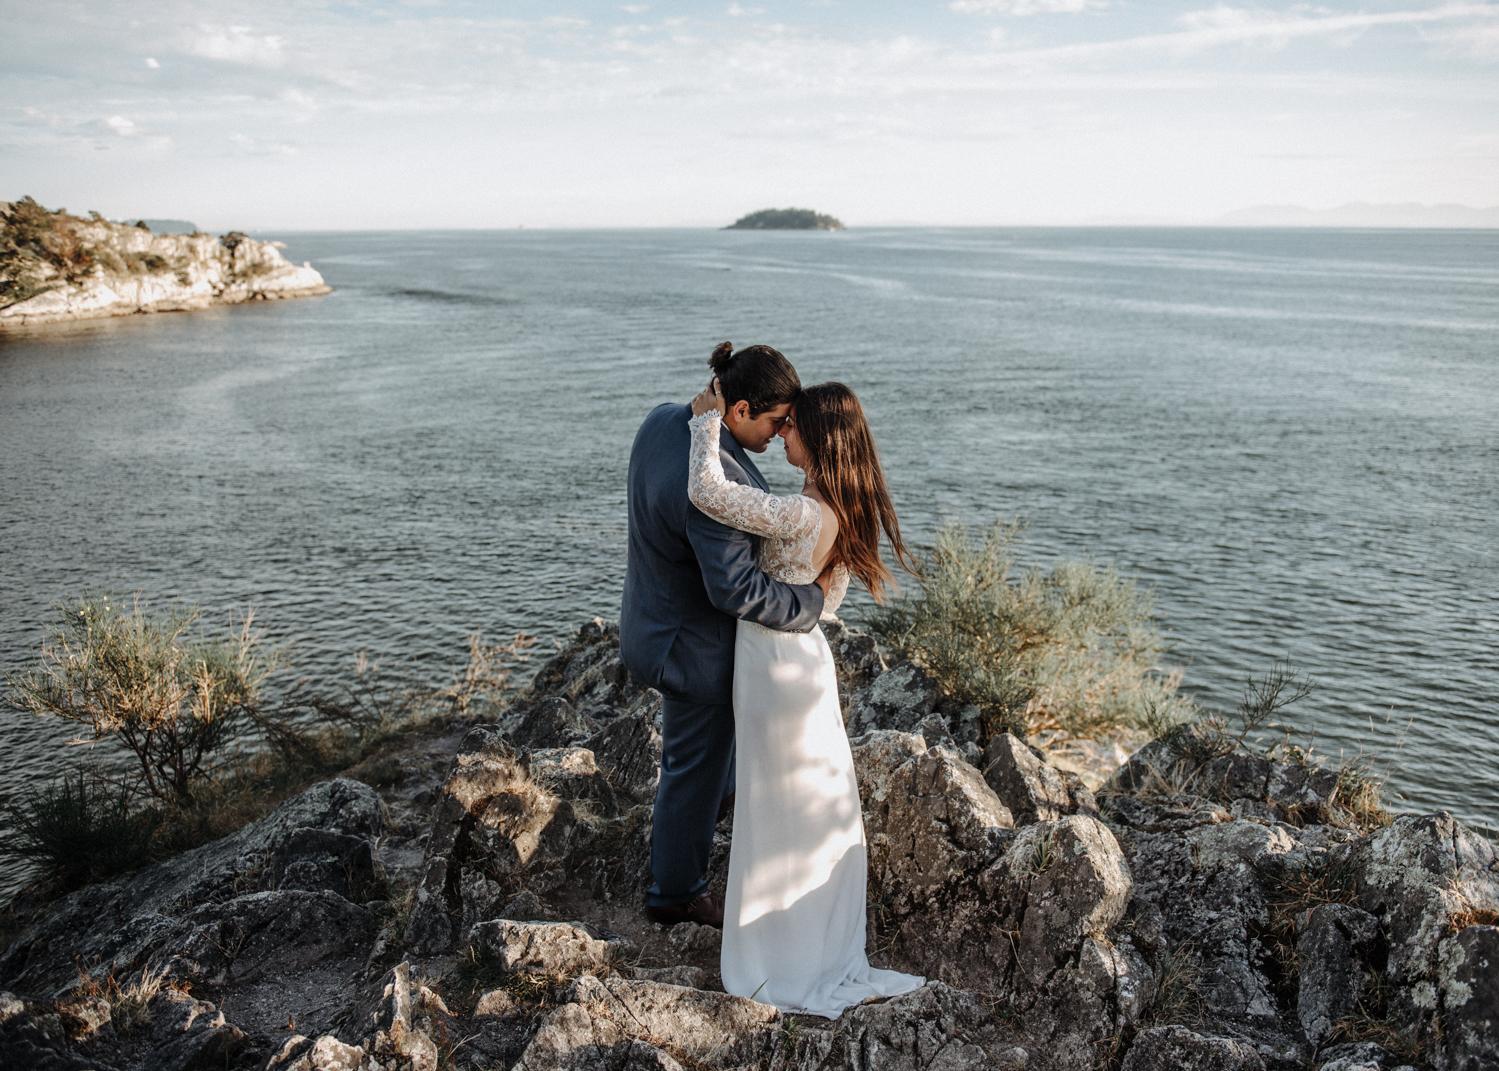 kaoverii_silva_photographer_lison_iman_wedding_websize-303.jpg